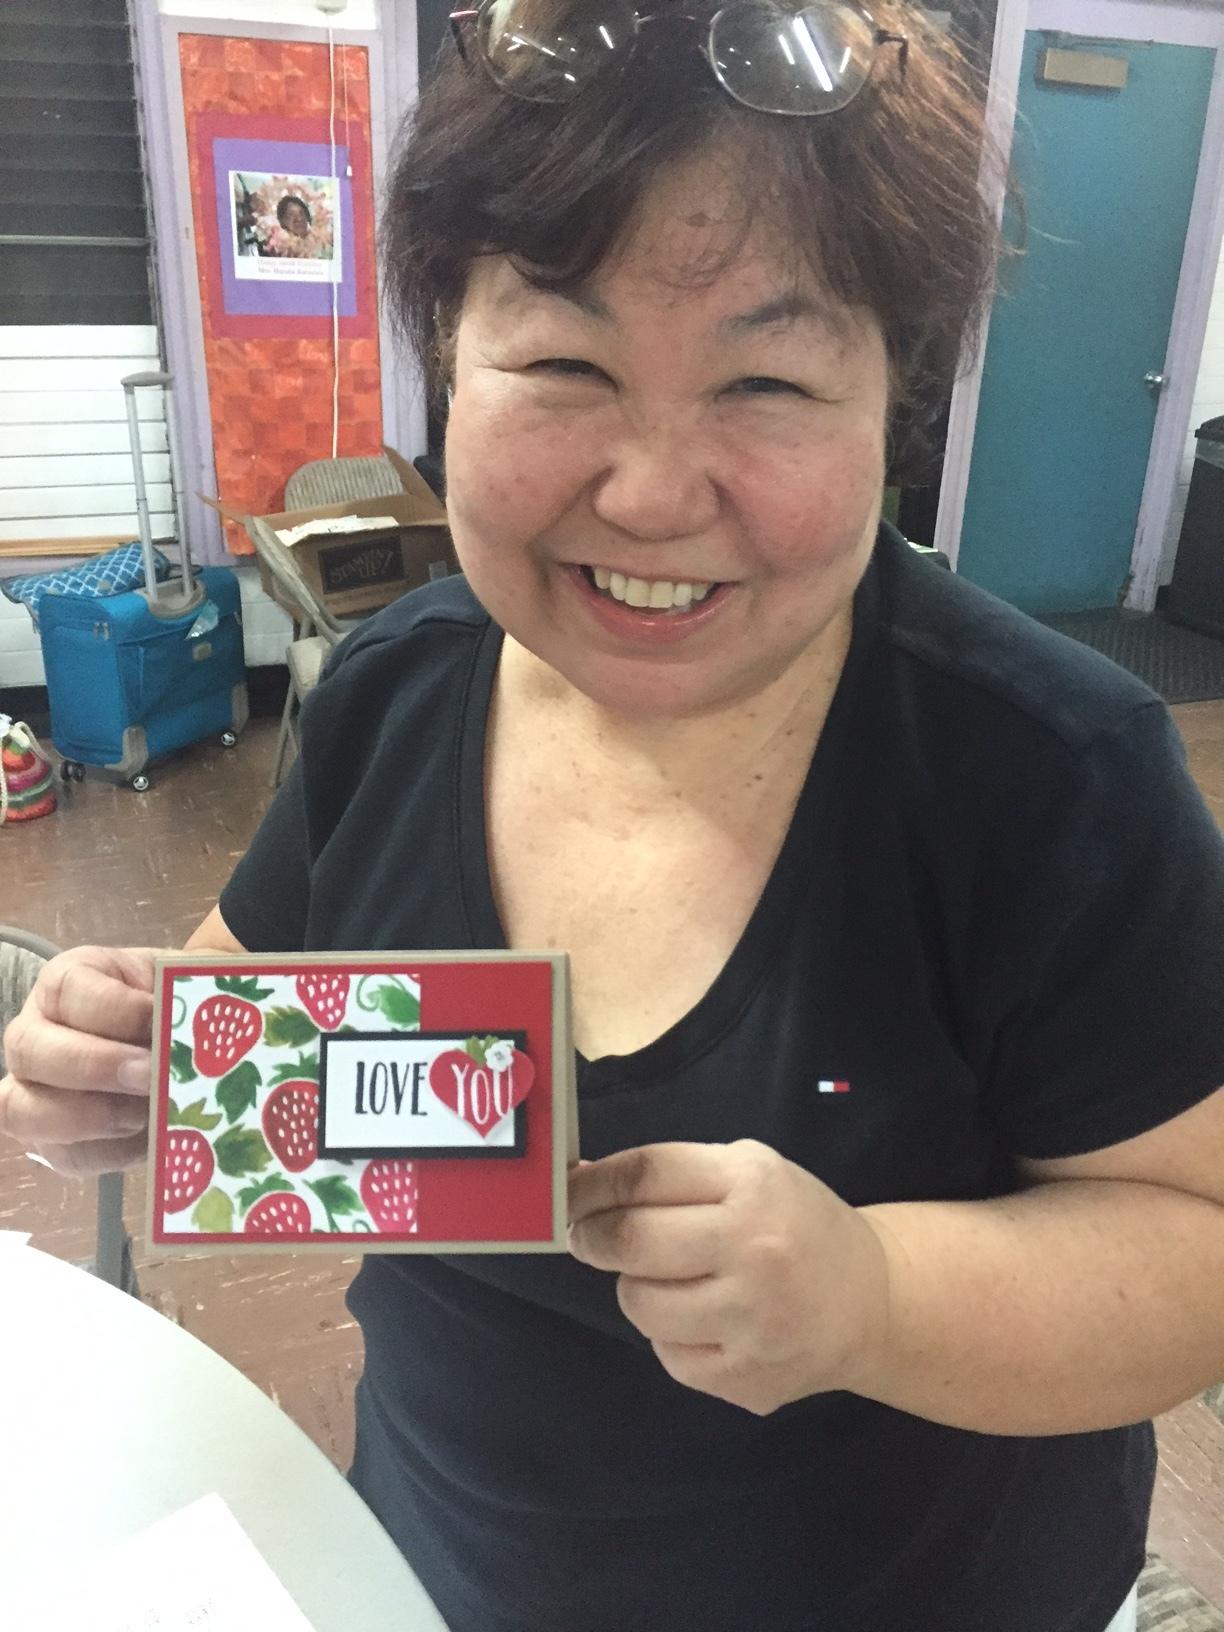 Stamped With Aloha Inspiration Night - www.stampedwithaloha.com